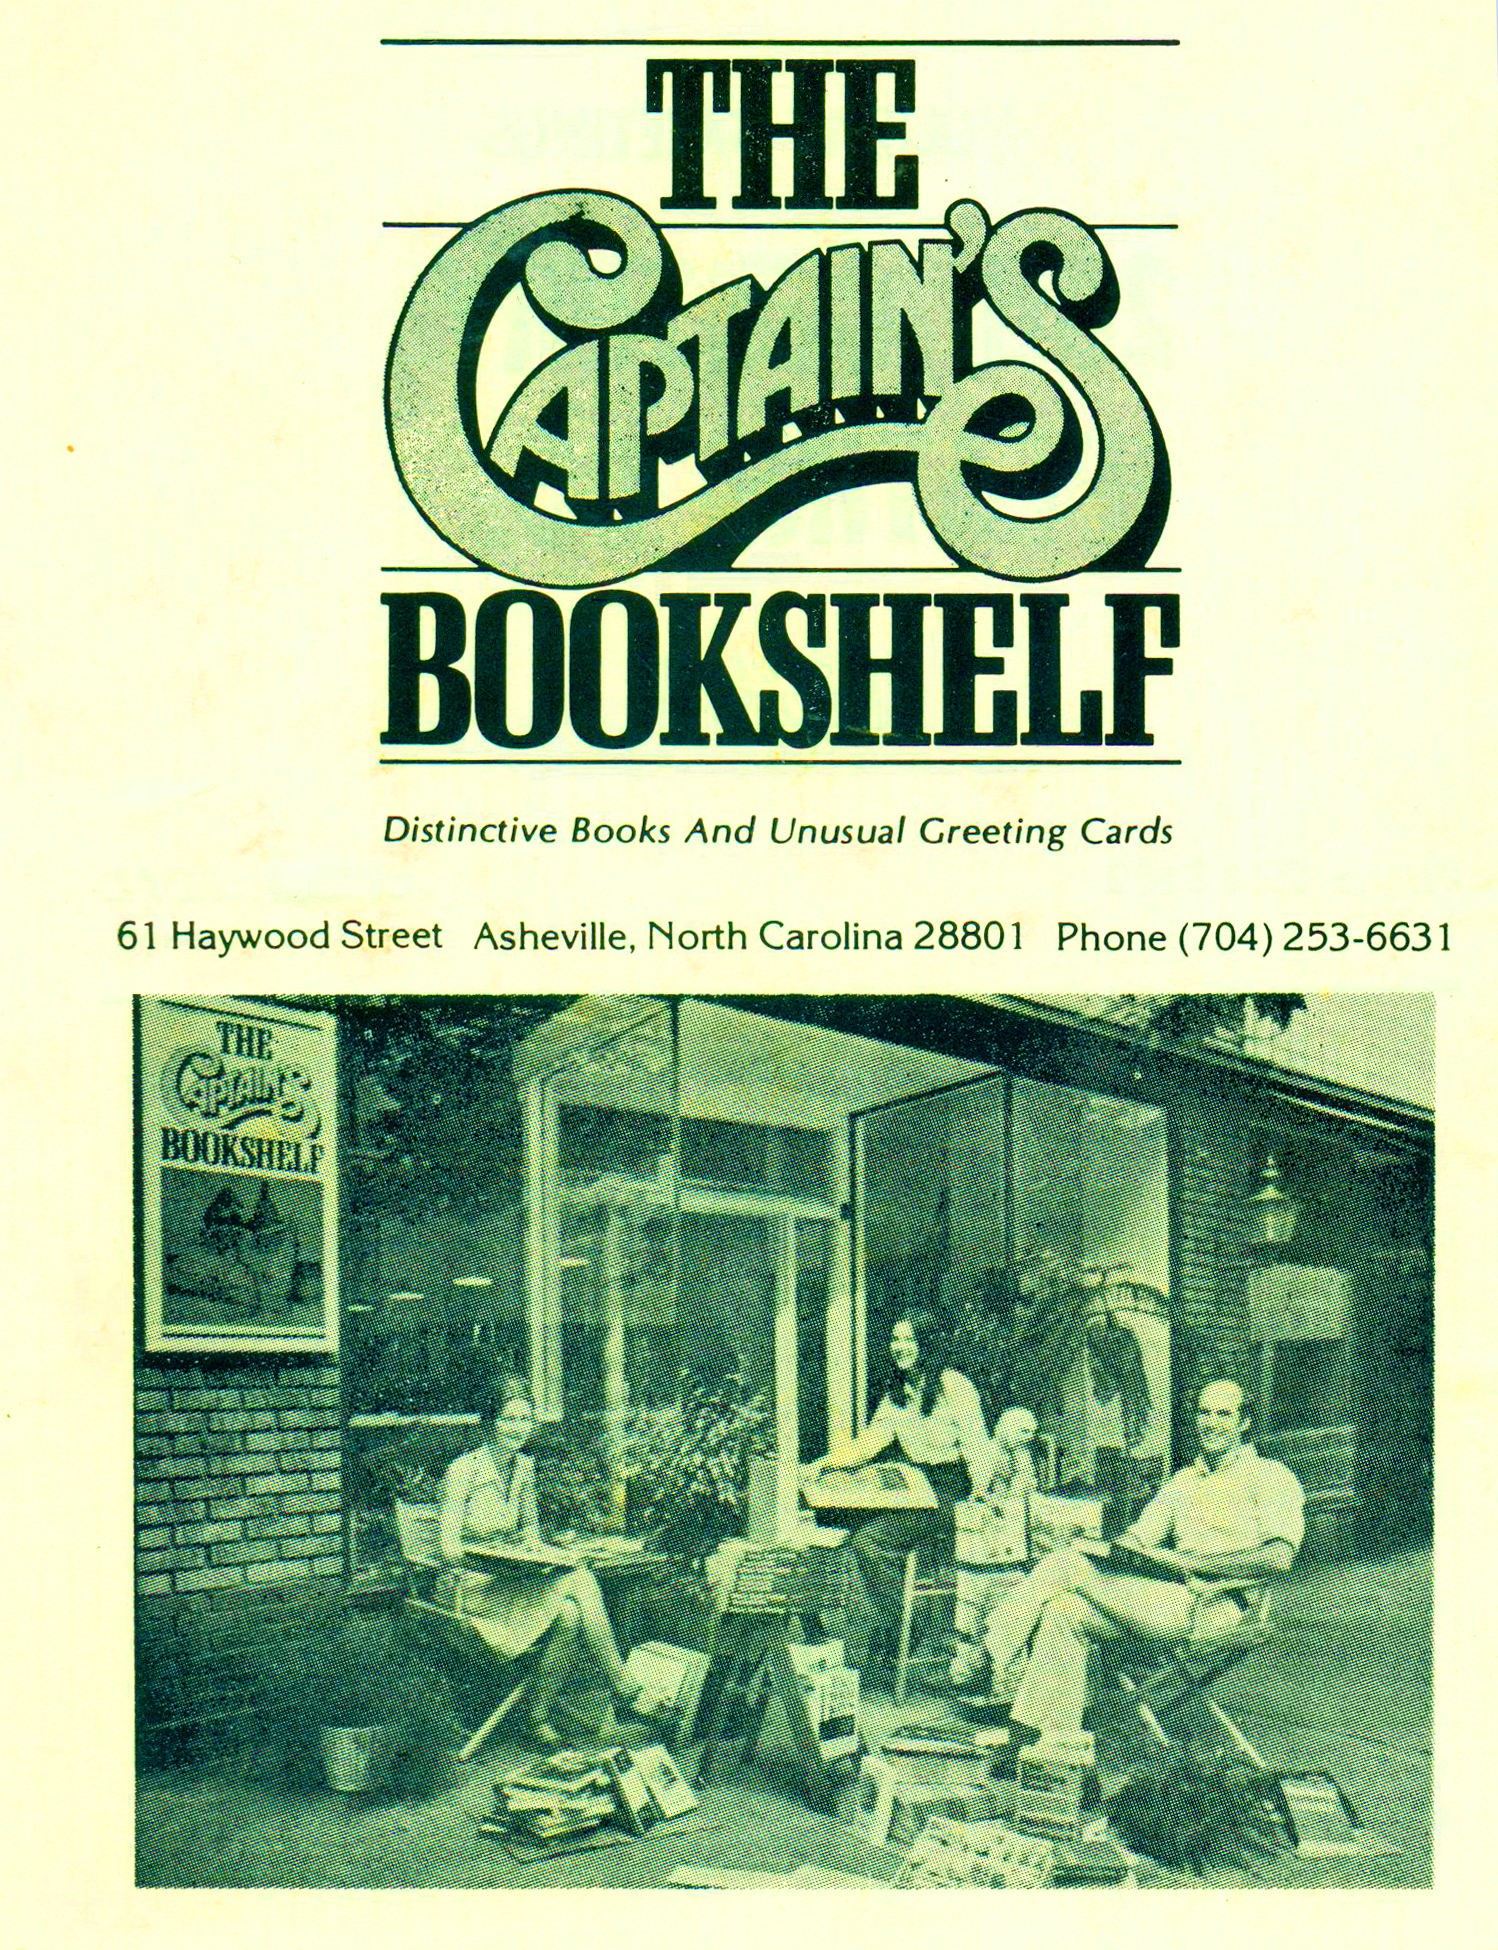 1980s Downtown Businesses Restaurants